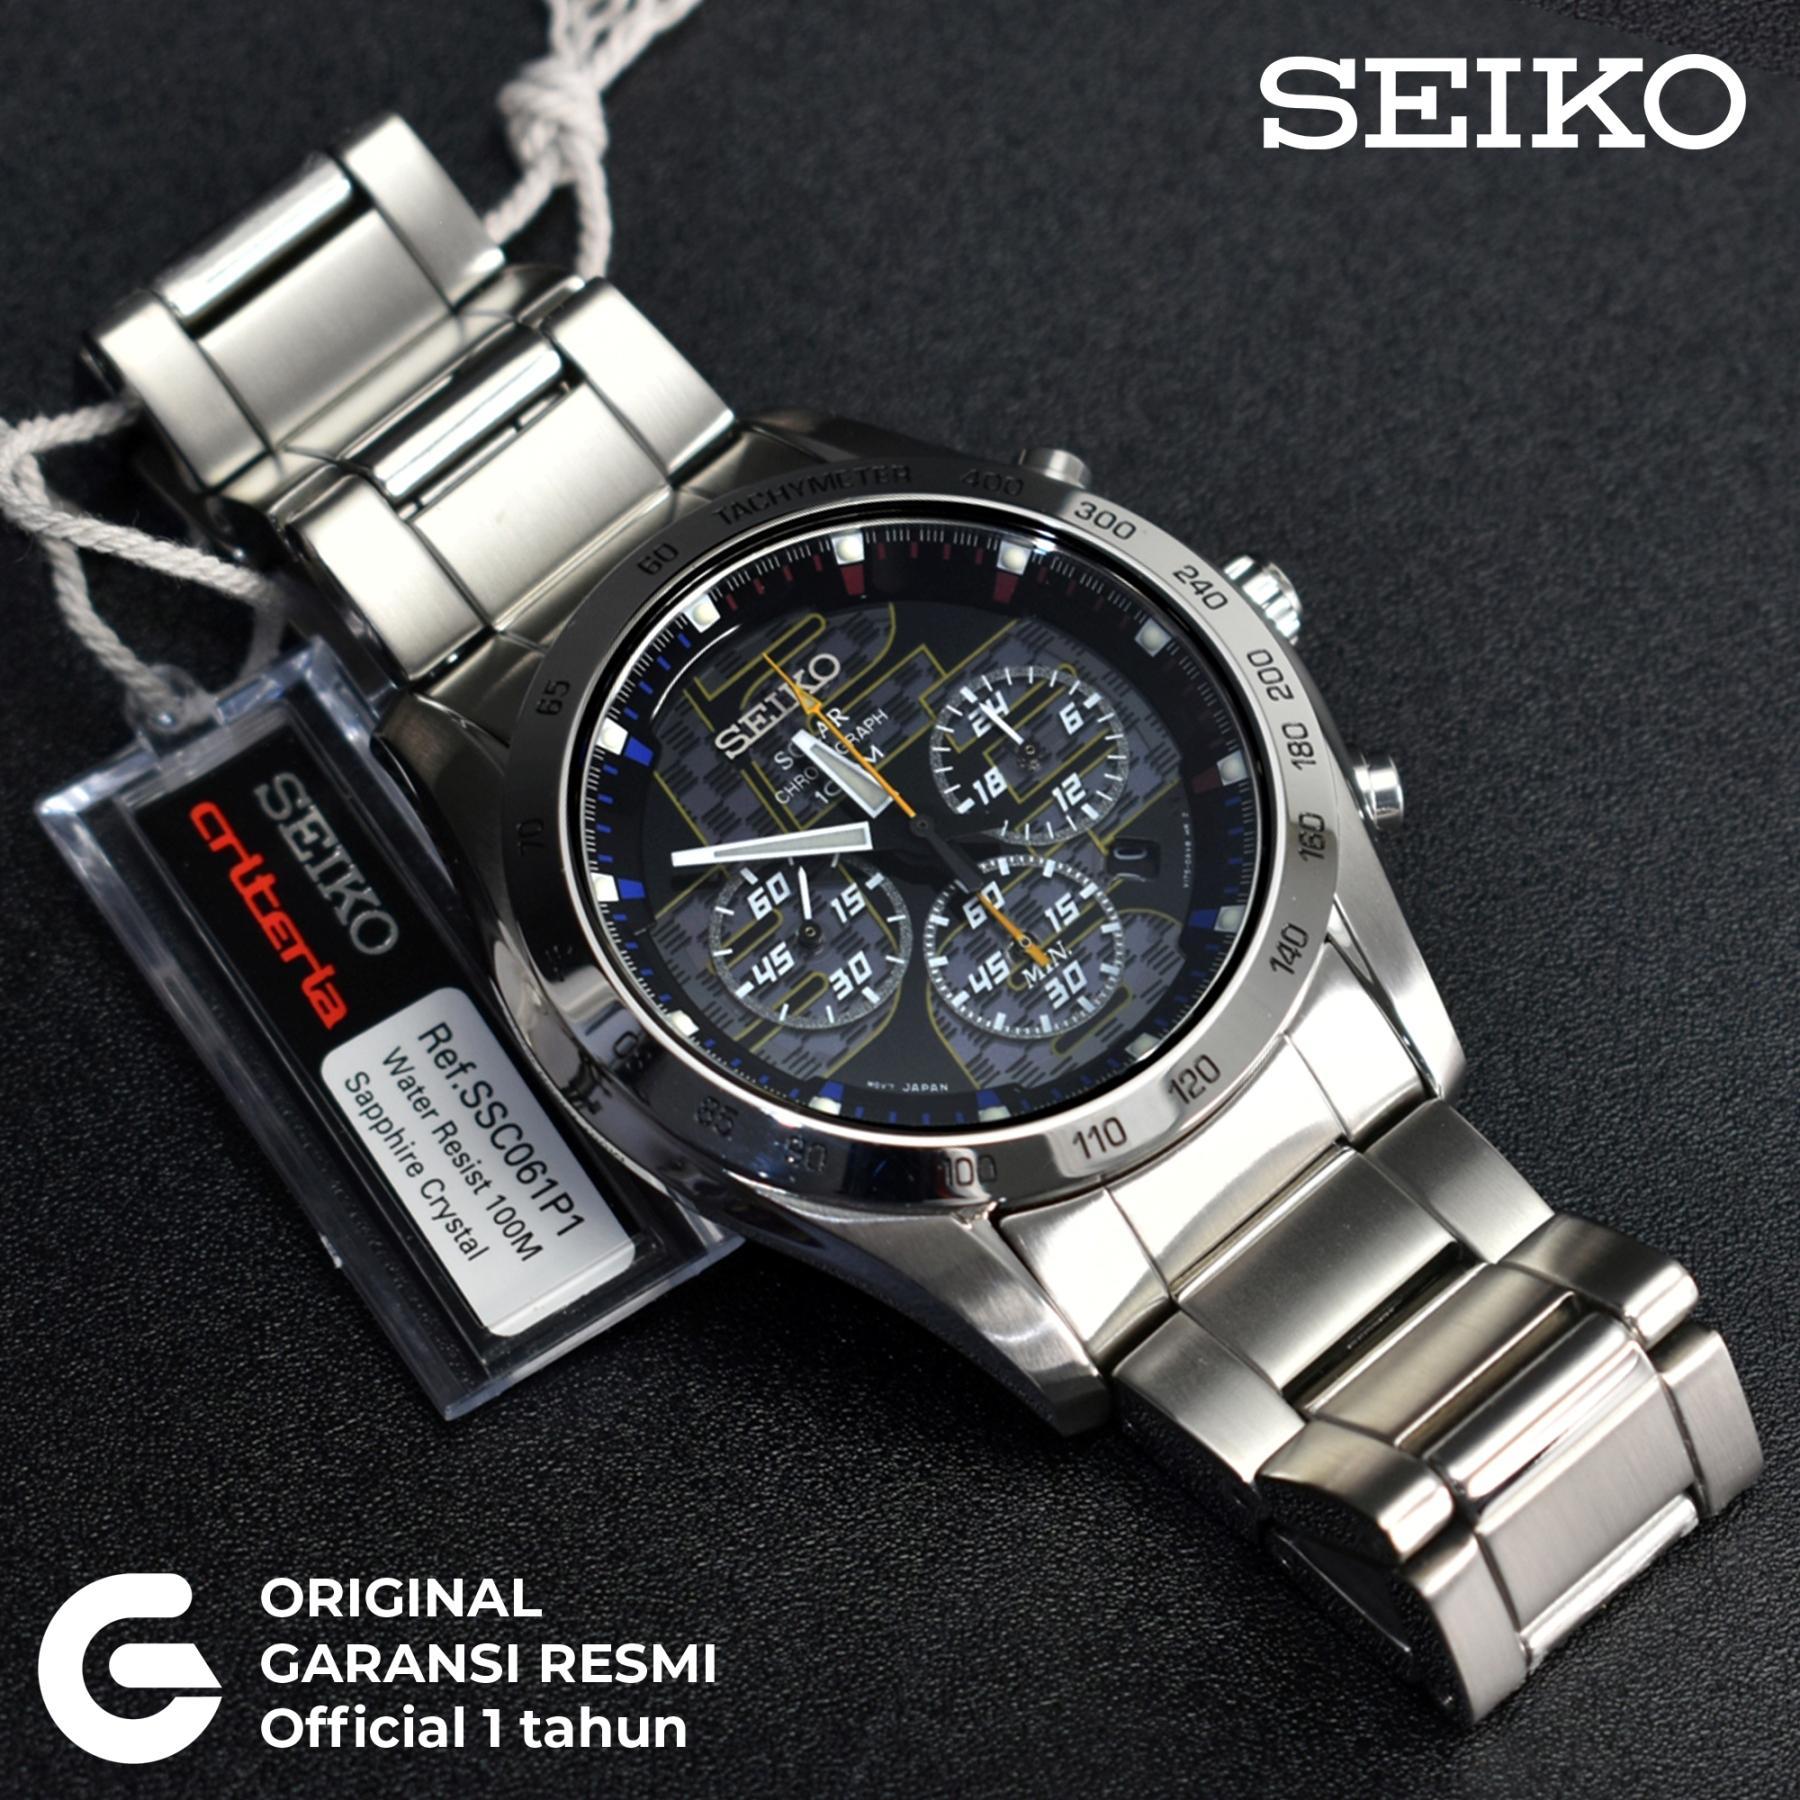 SEIKO Jam Tangan Pria SEIKO Solar Chronograph Tali Rantai Logam Stainless  Steel Anti Air Tenaga Matahari 643c903aa2